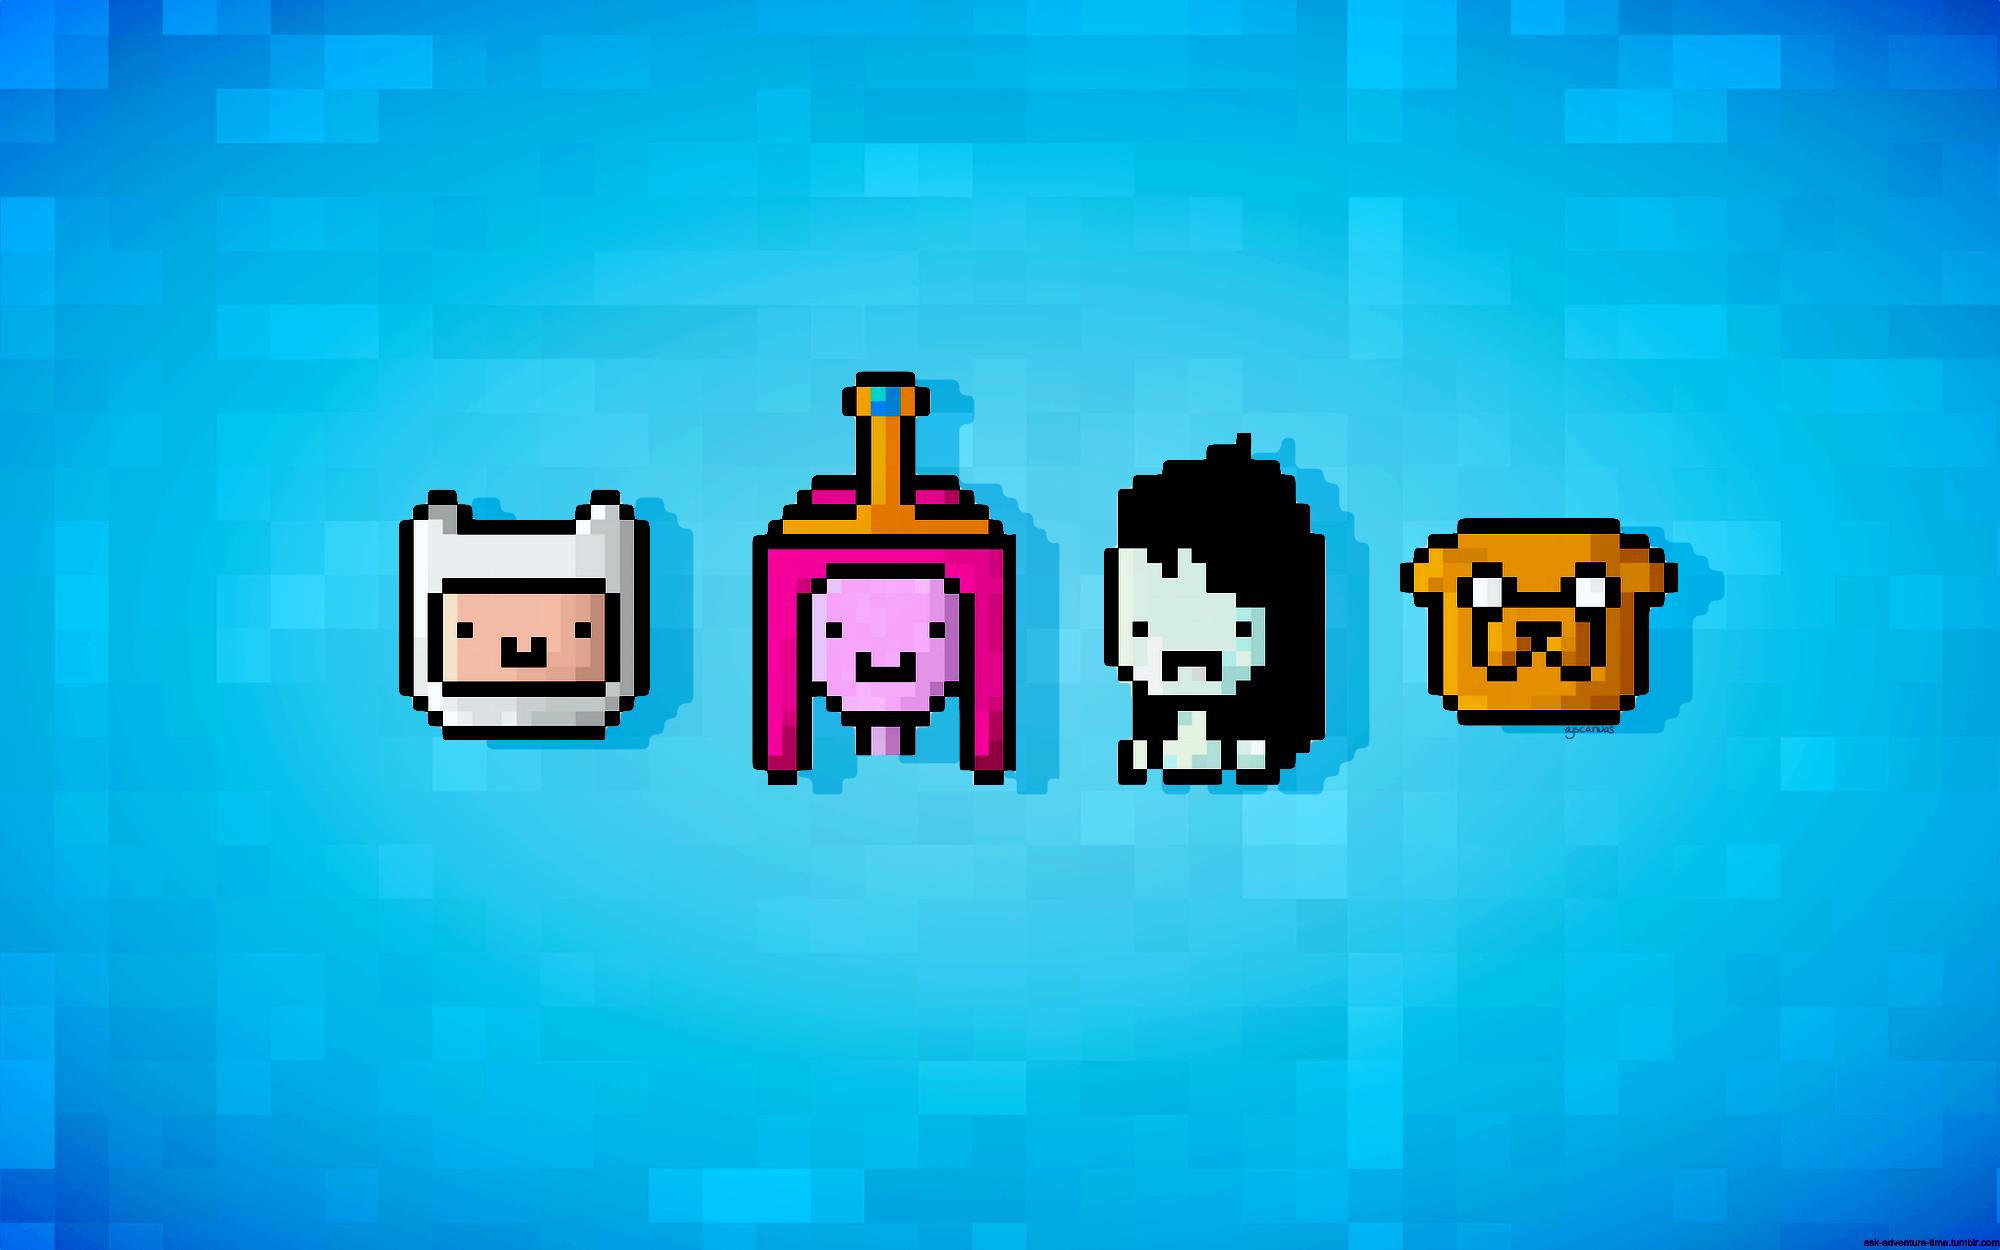 Adventure Time Princess Bubblegum 16 Bit Finn And Jake Free